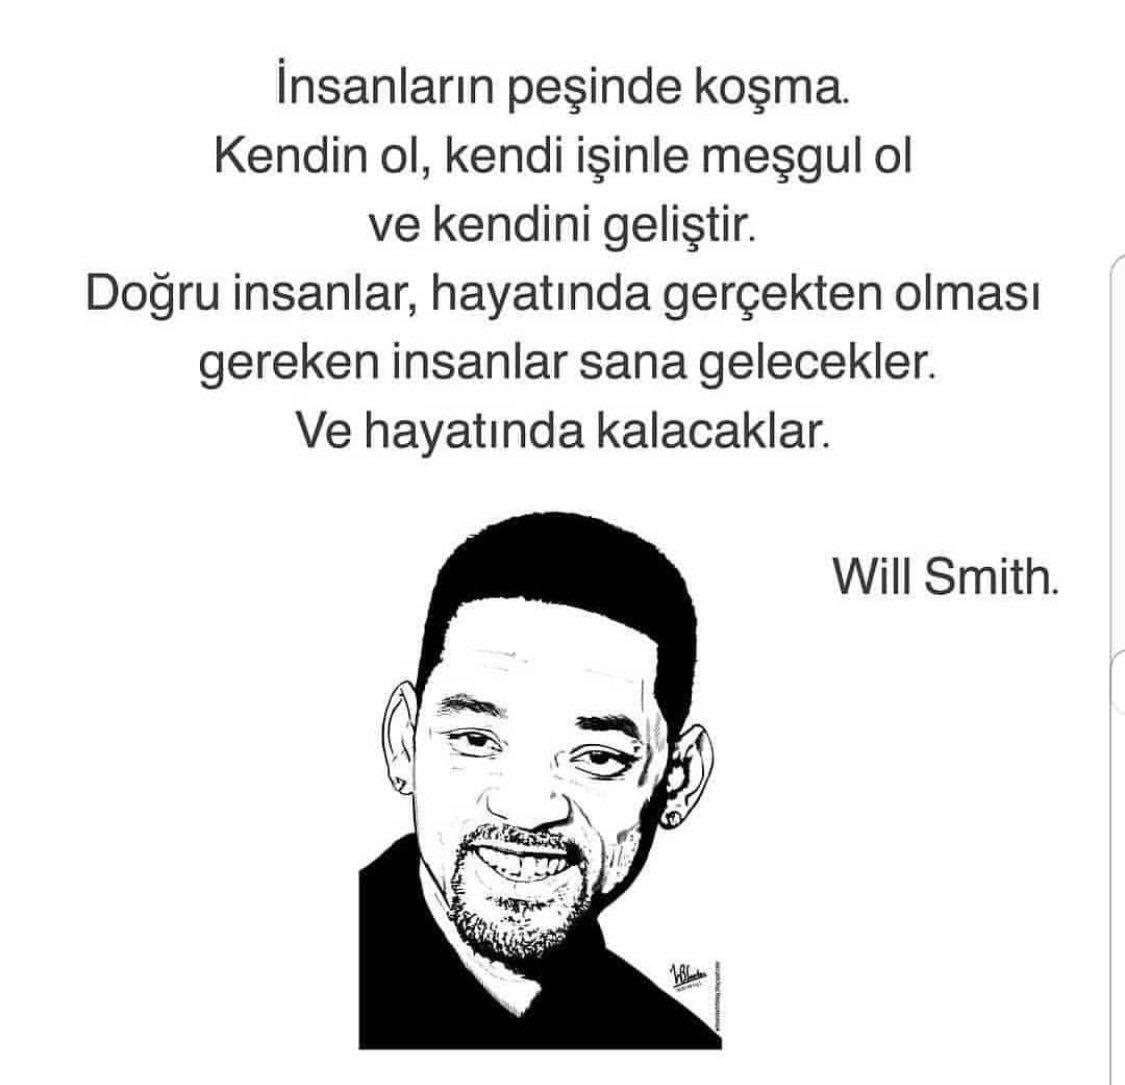 Will Smith. https://t.co/5Q4e4xOpRb